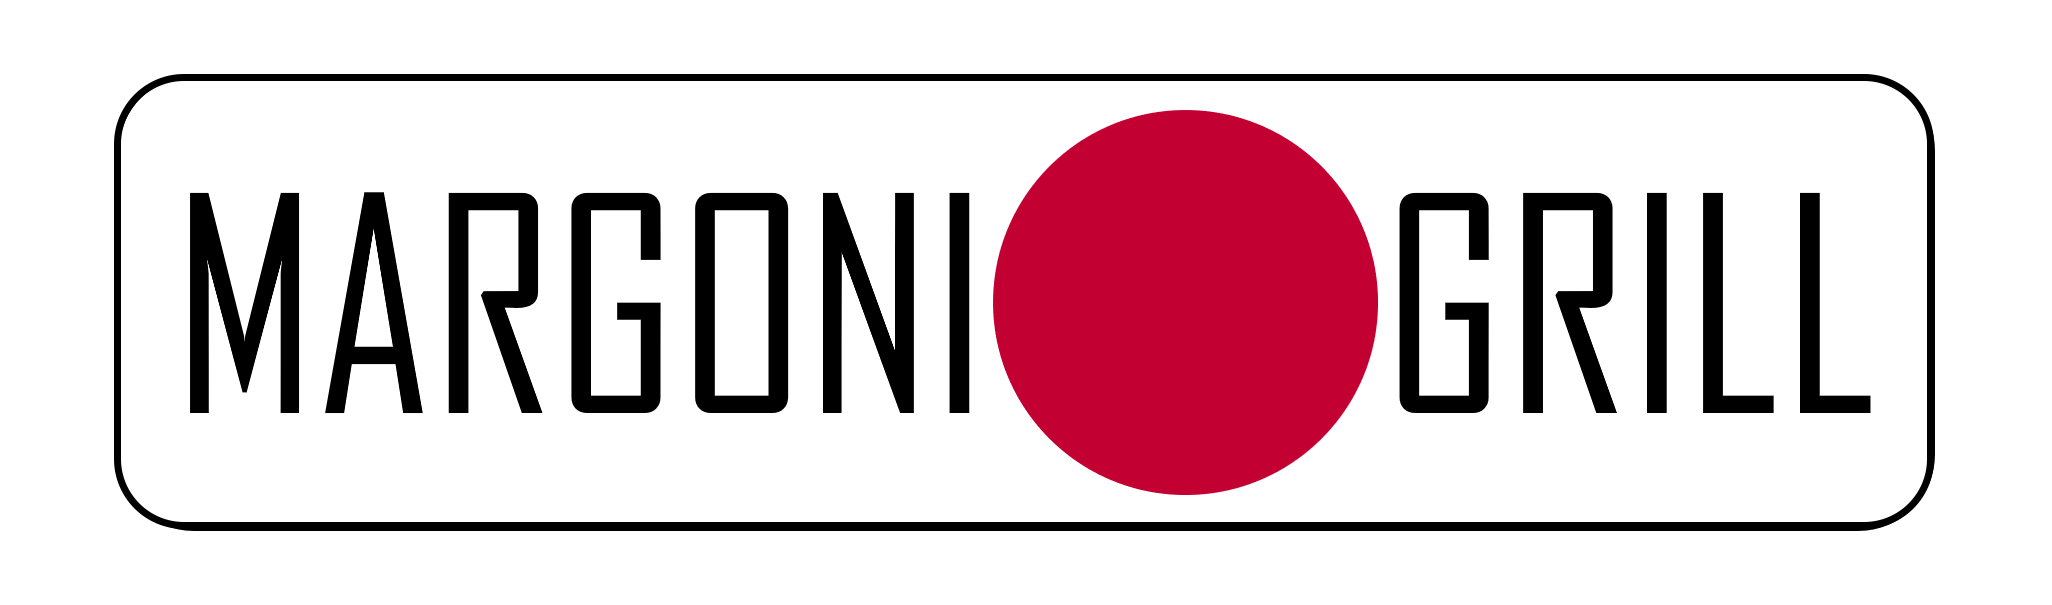 Margoni Grill